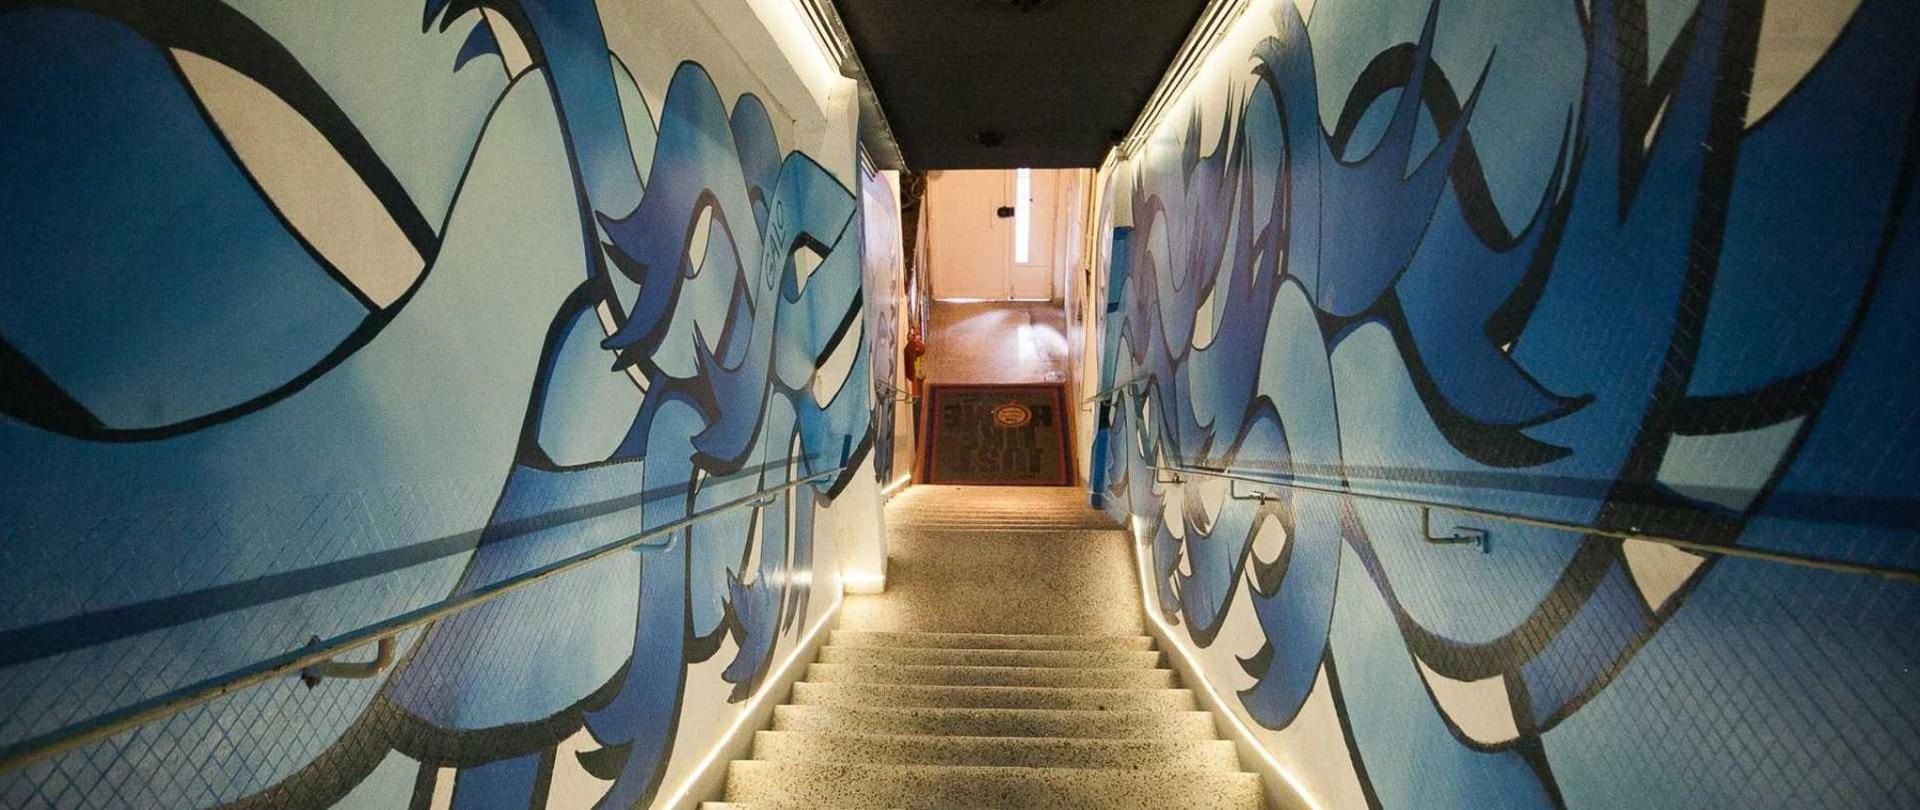 Hostel Paulista SP5.jpg